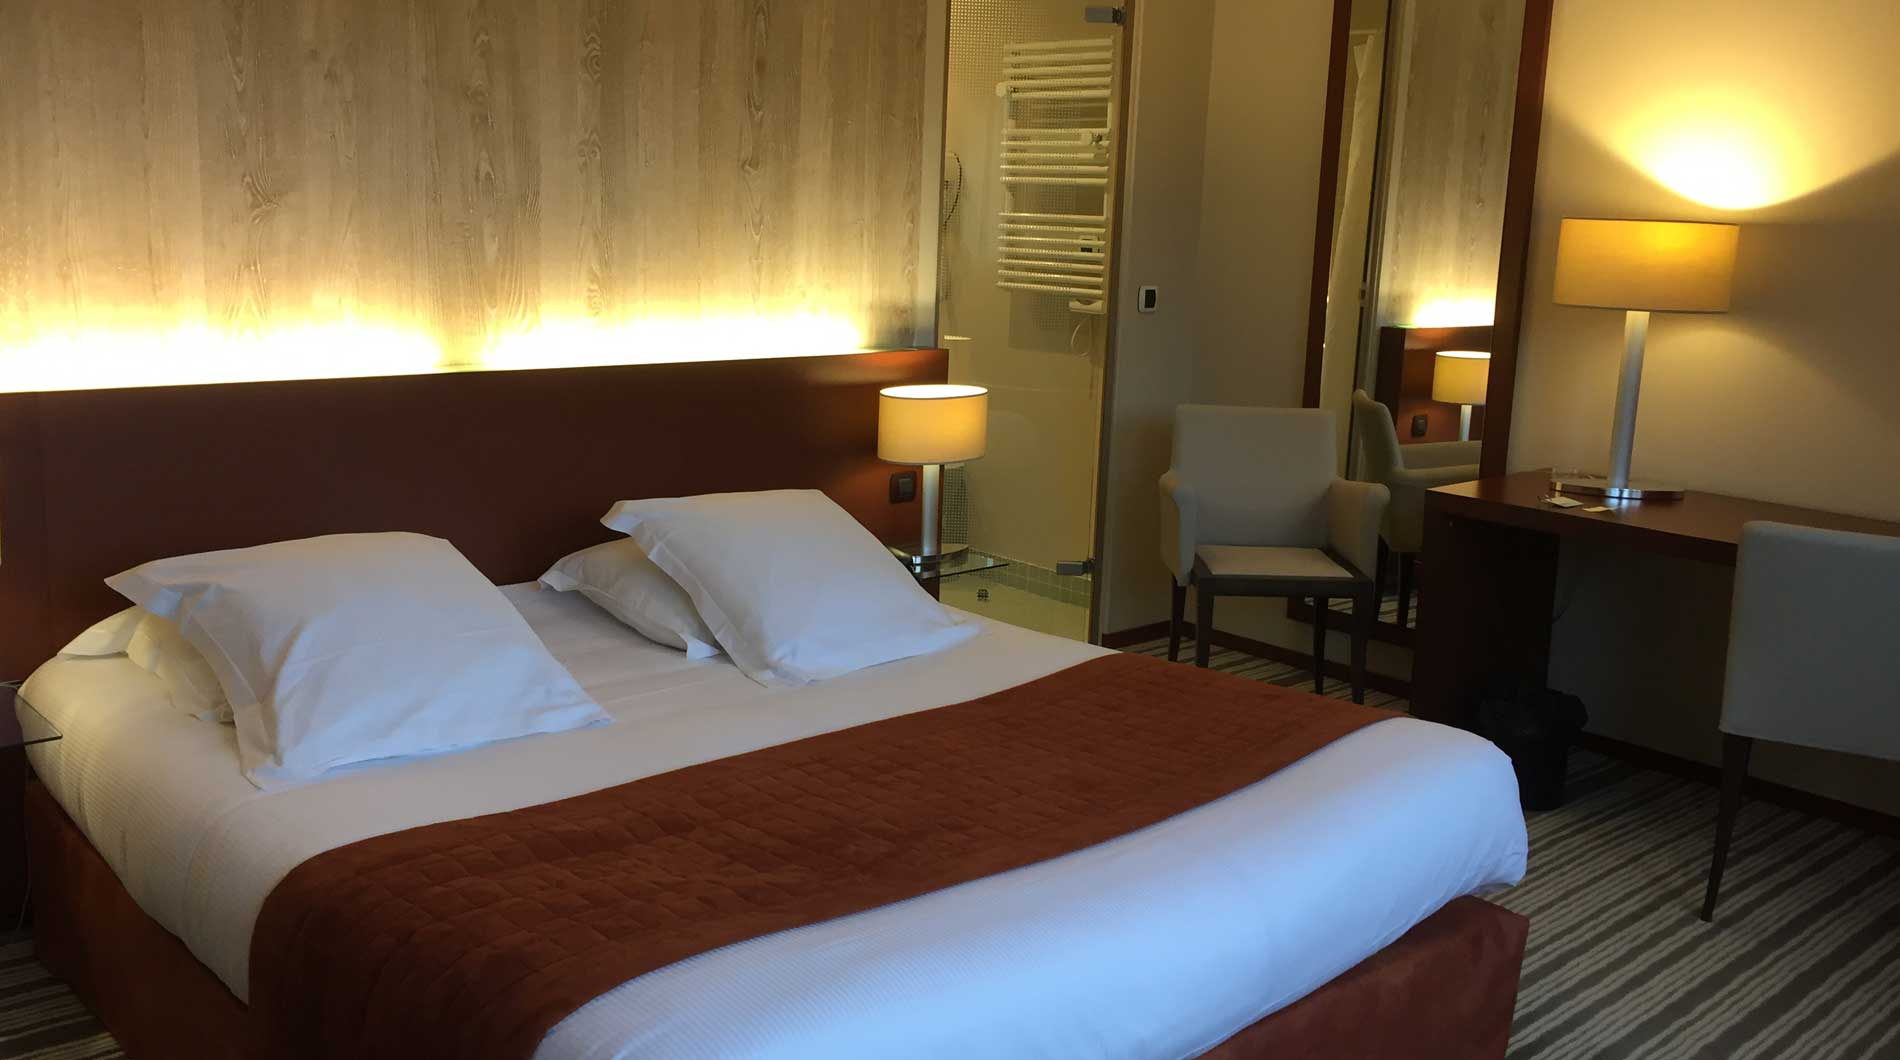 HOTEL DU CASINO SAINT VALERY EN CAUX RESTAURANT